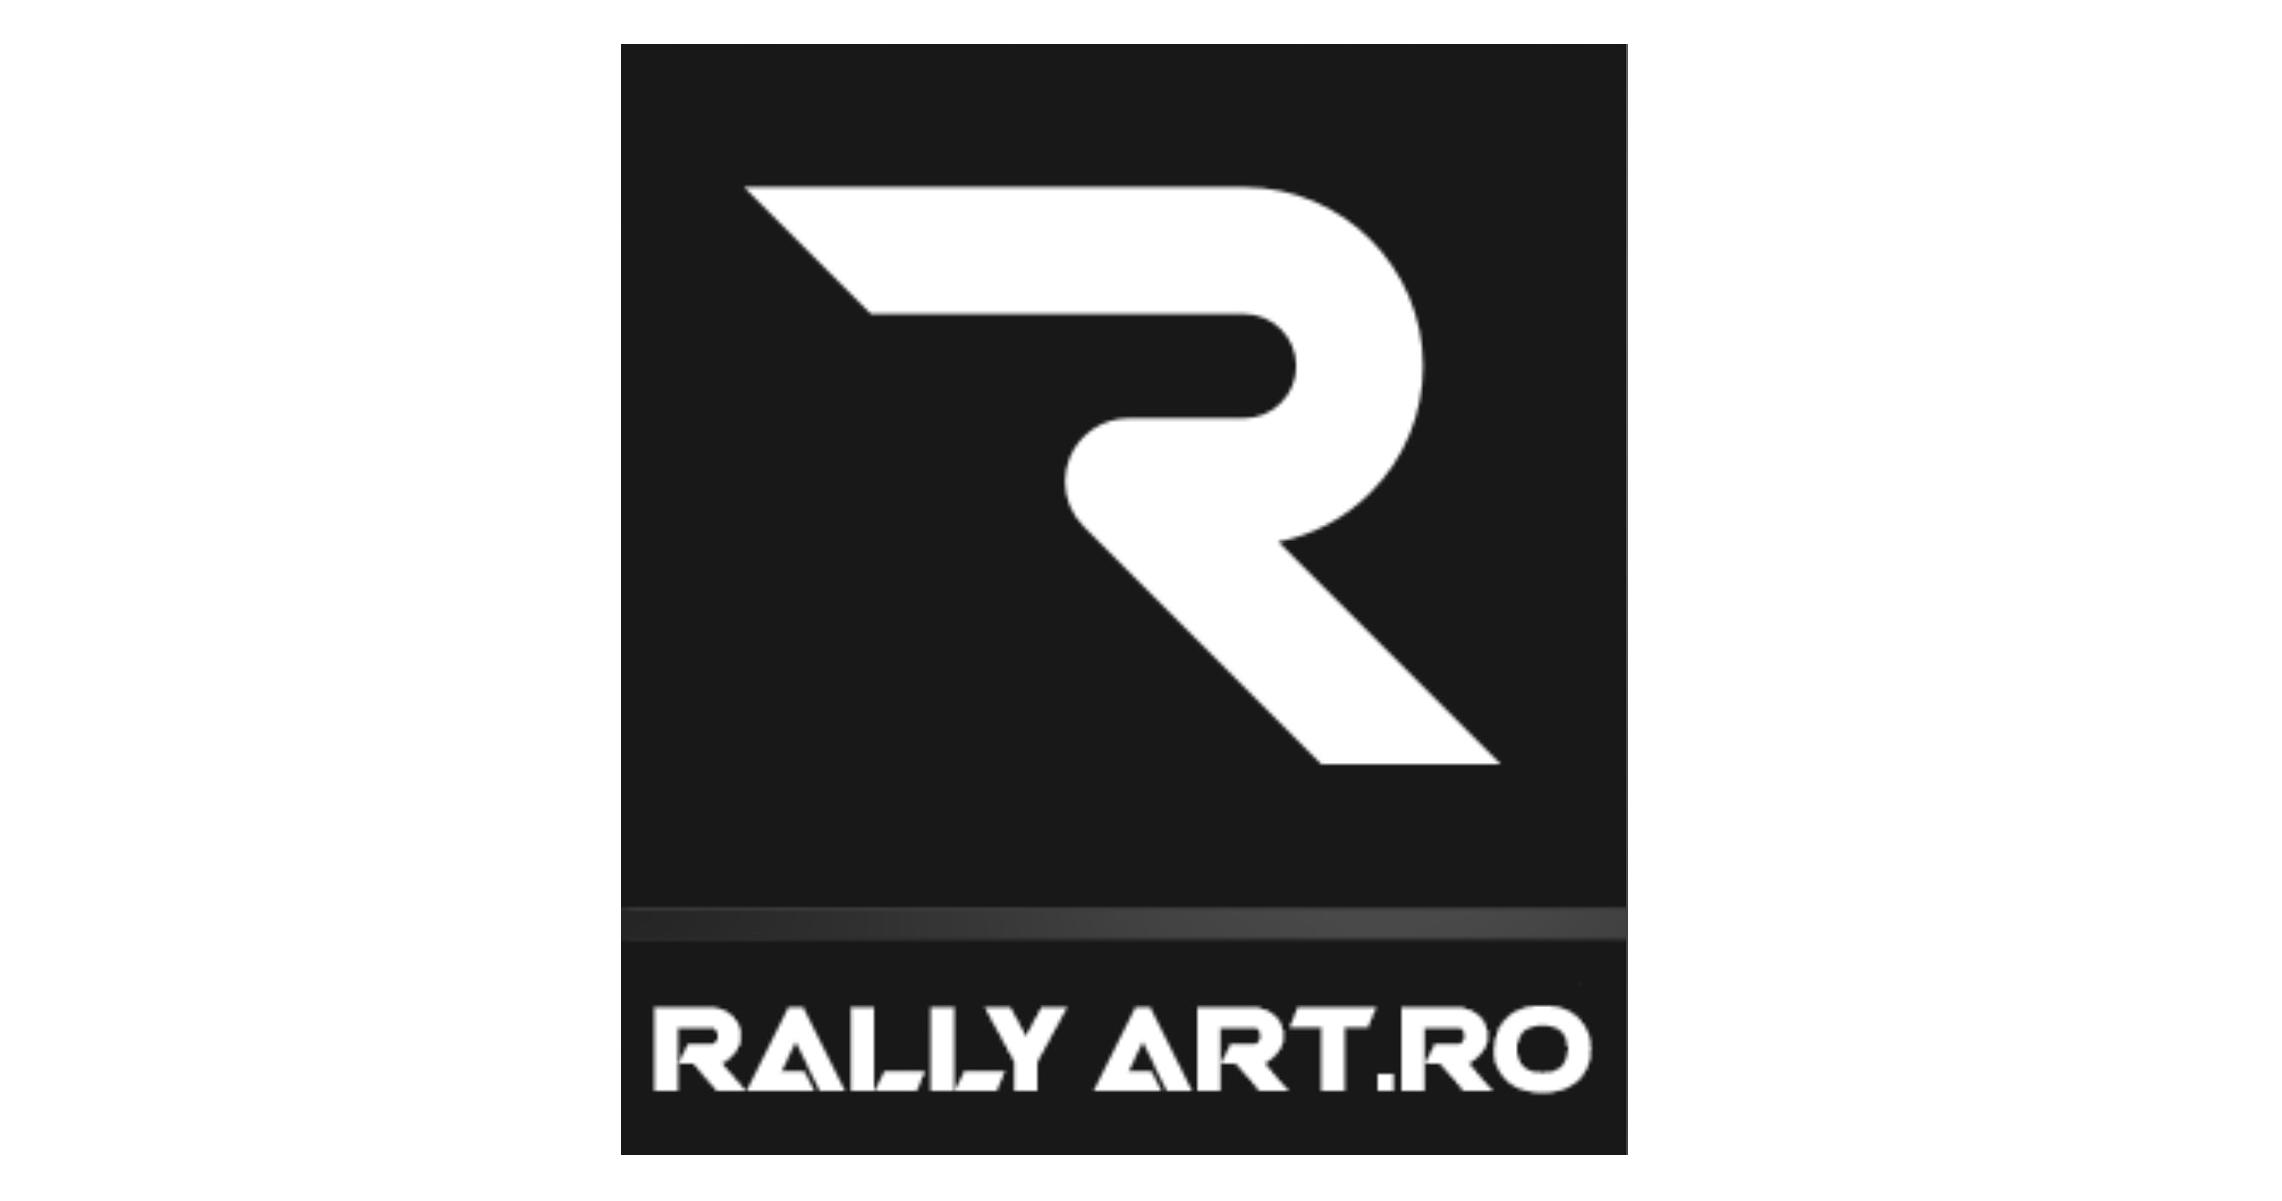 RallyArt